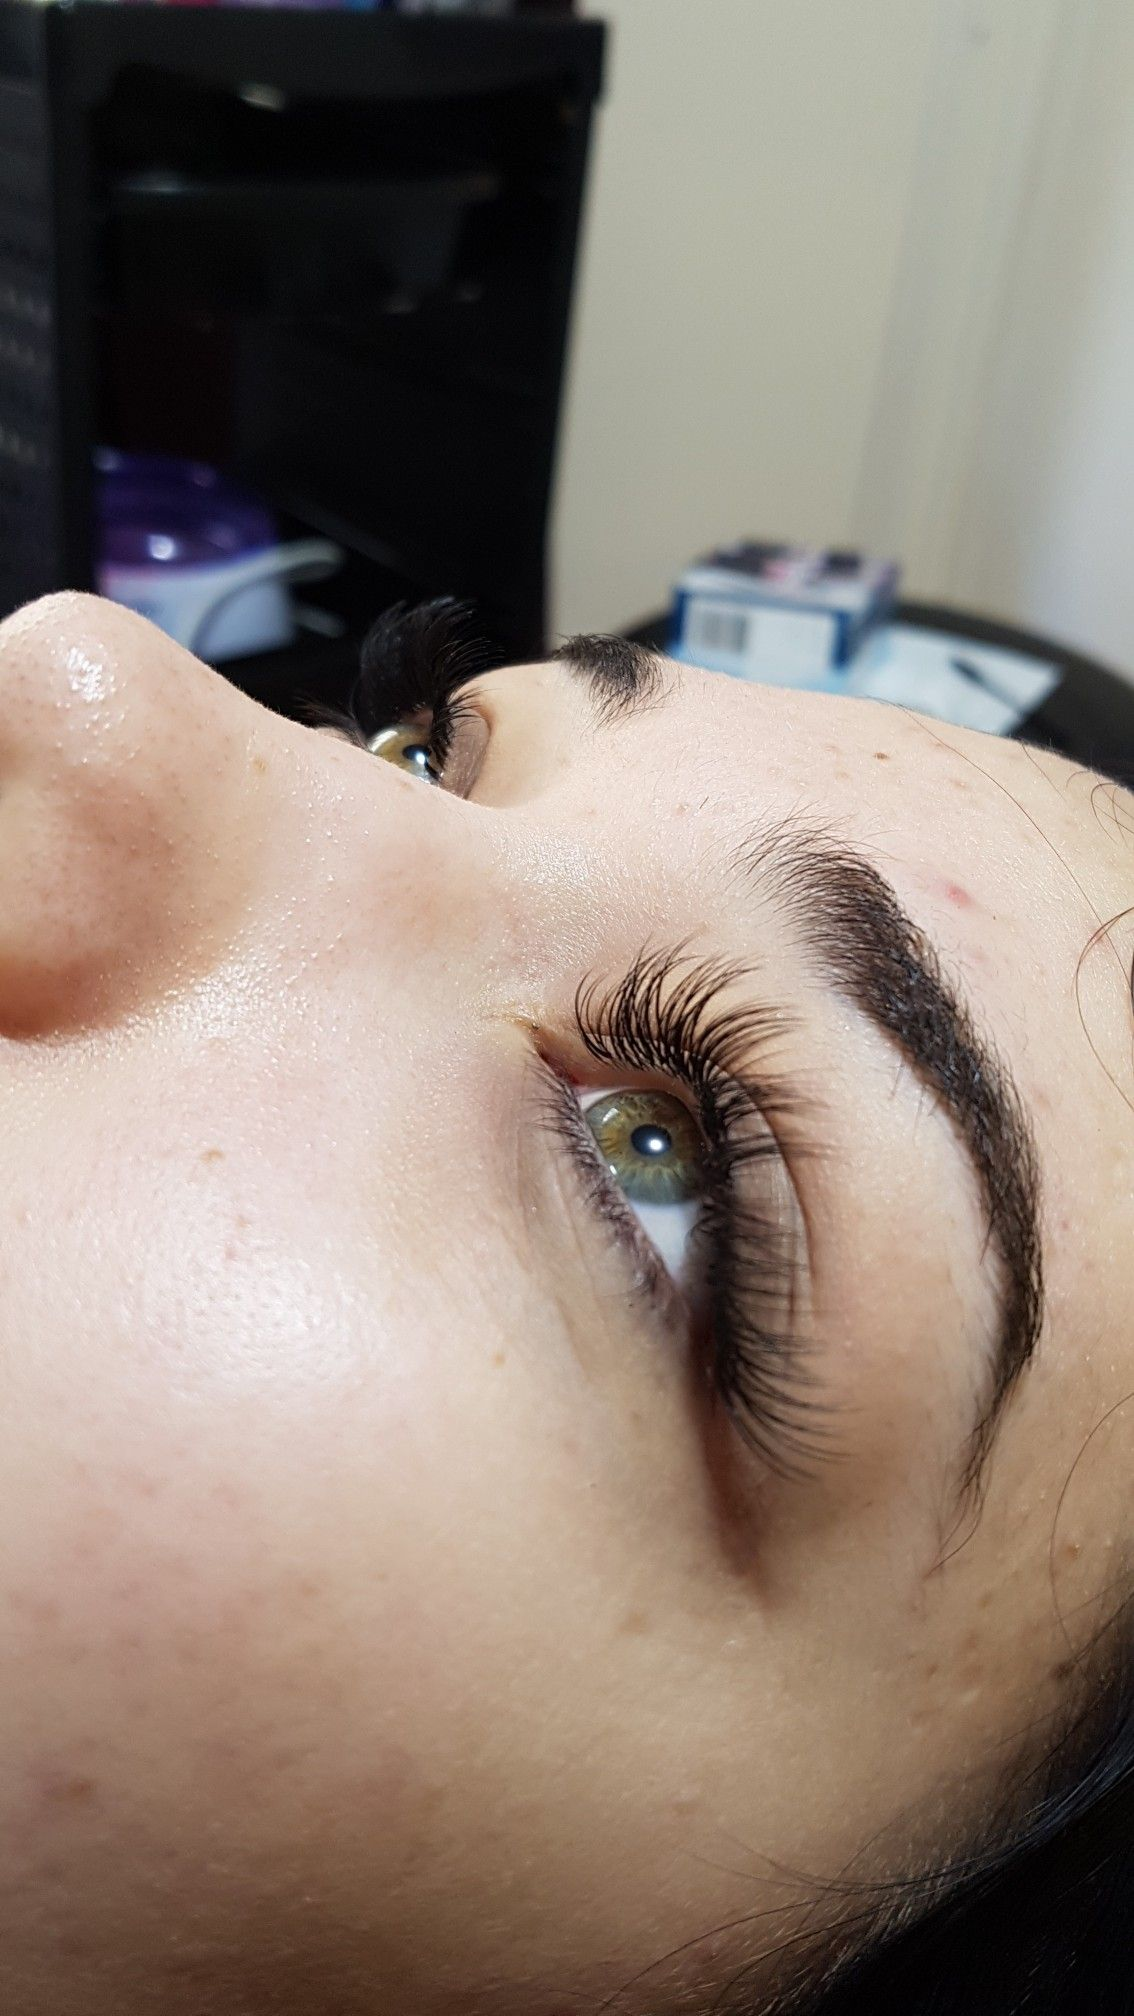 Individual Eyelash Extensions Done By Brisbane Lash Brow Artistry